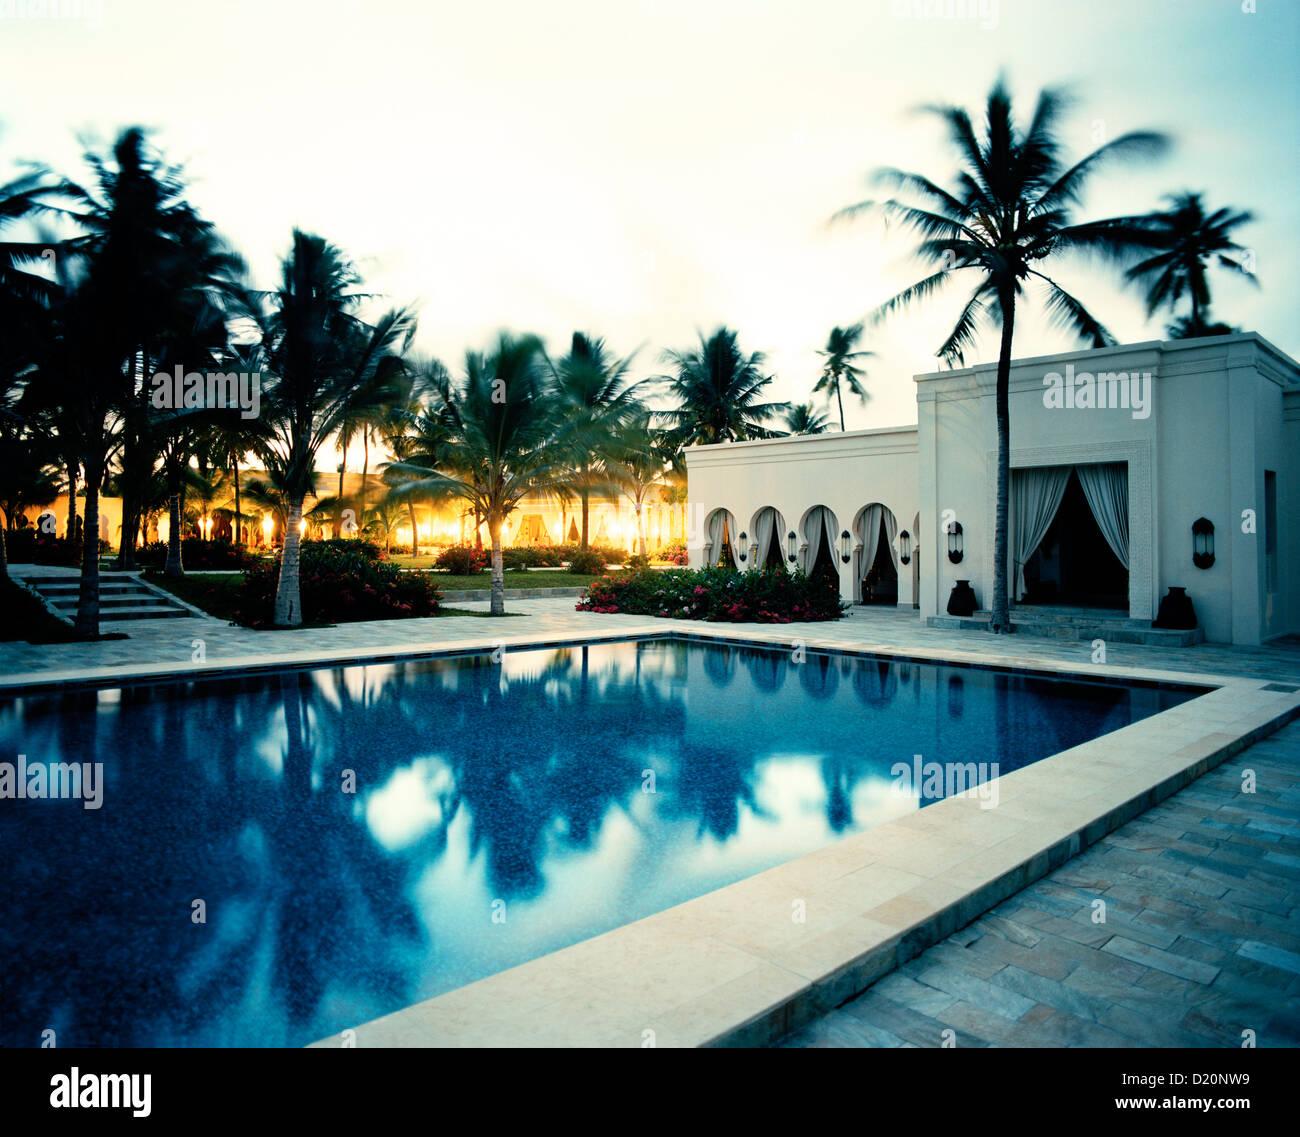 Courtyard with palm trees, Restaurant and Pool of Baraza Spa and Resort in Bwejuu, East Coast, Zanzibar, Tanzania, - Stock Image